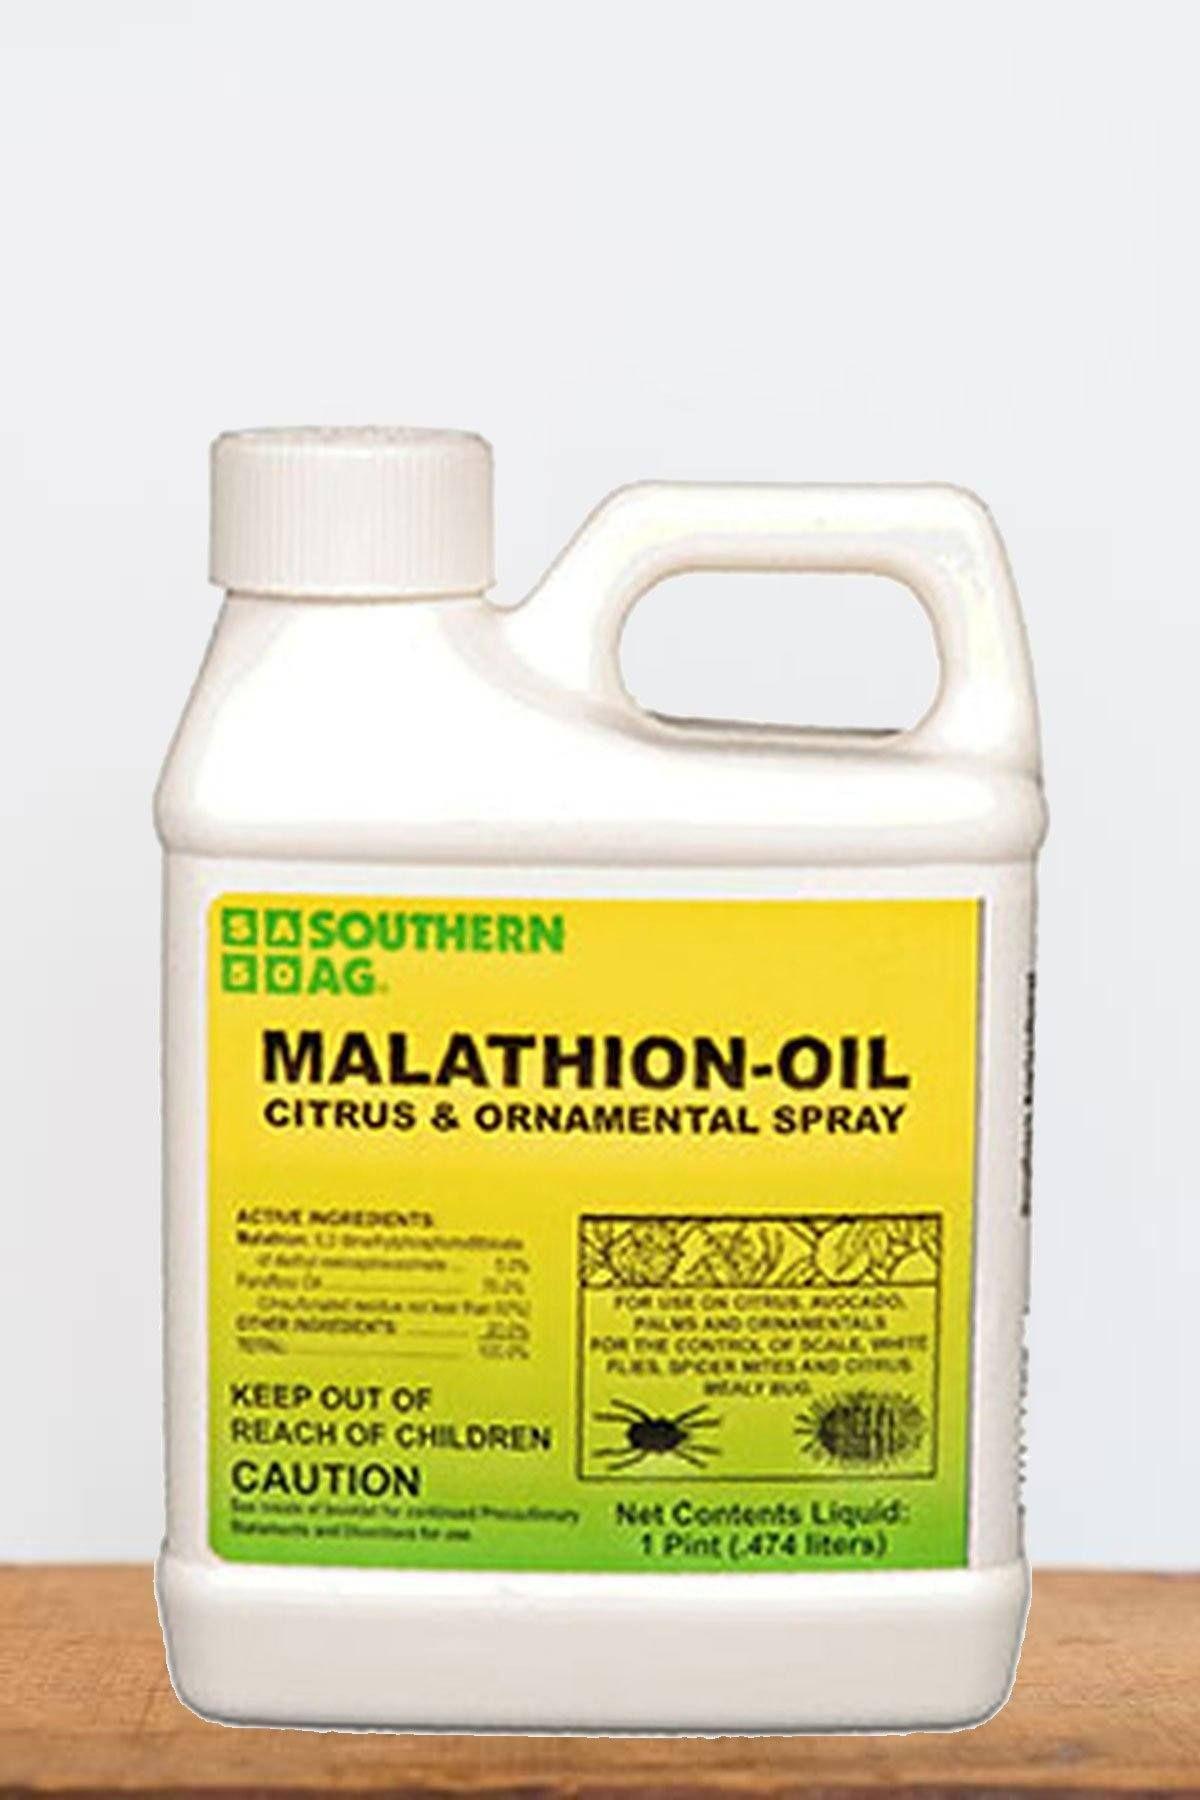 Southern Ag Malathion-Oil Citrus & Ornamental Spray